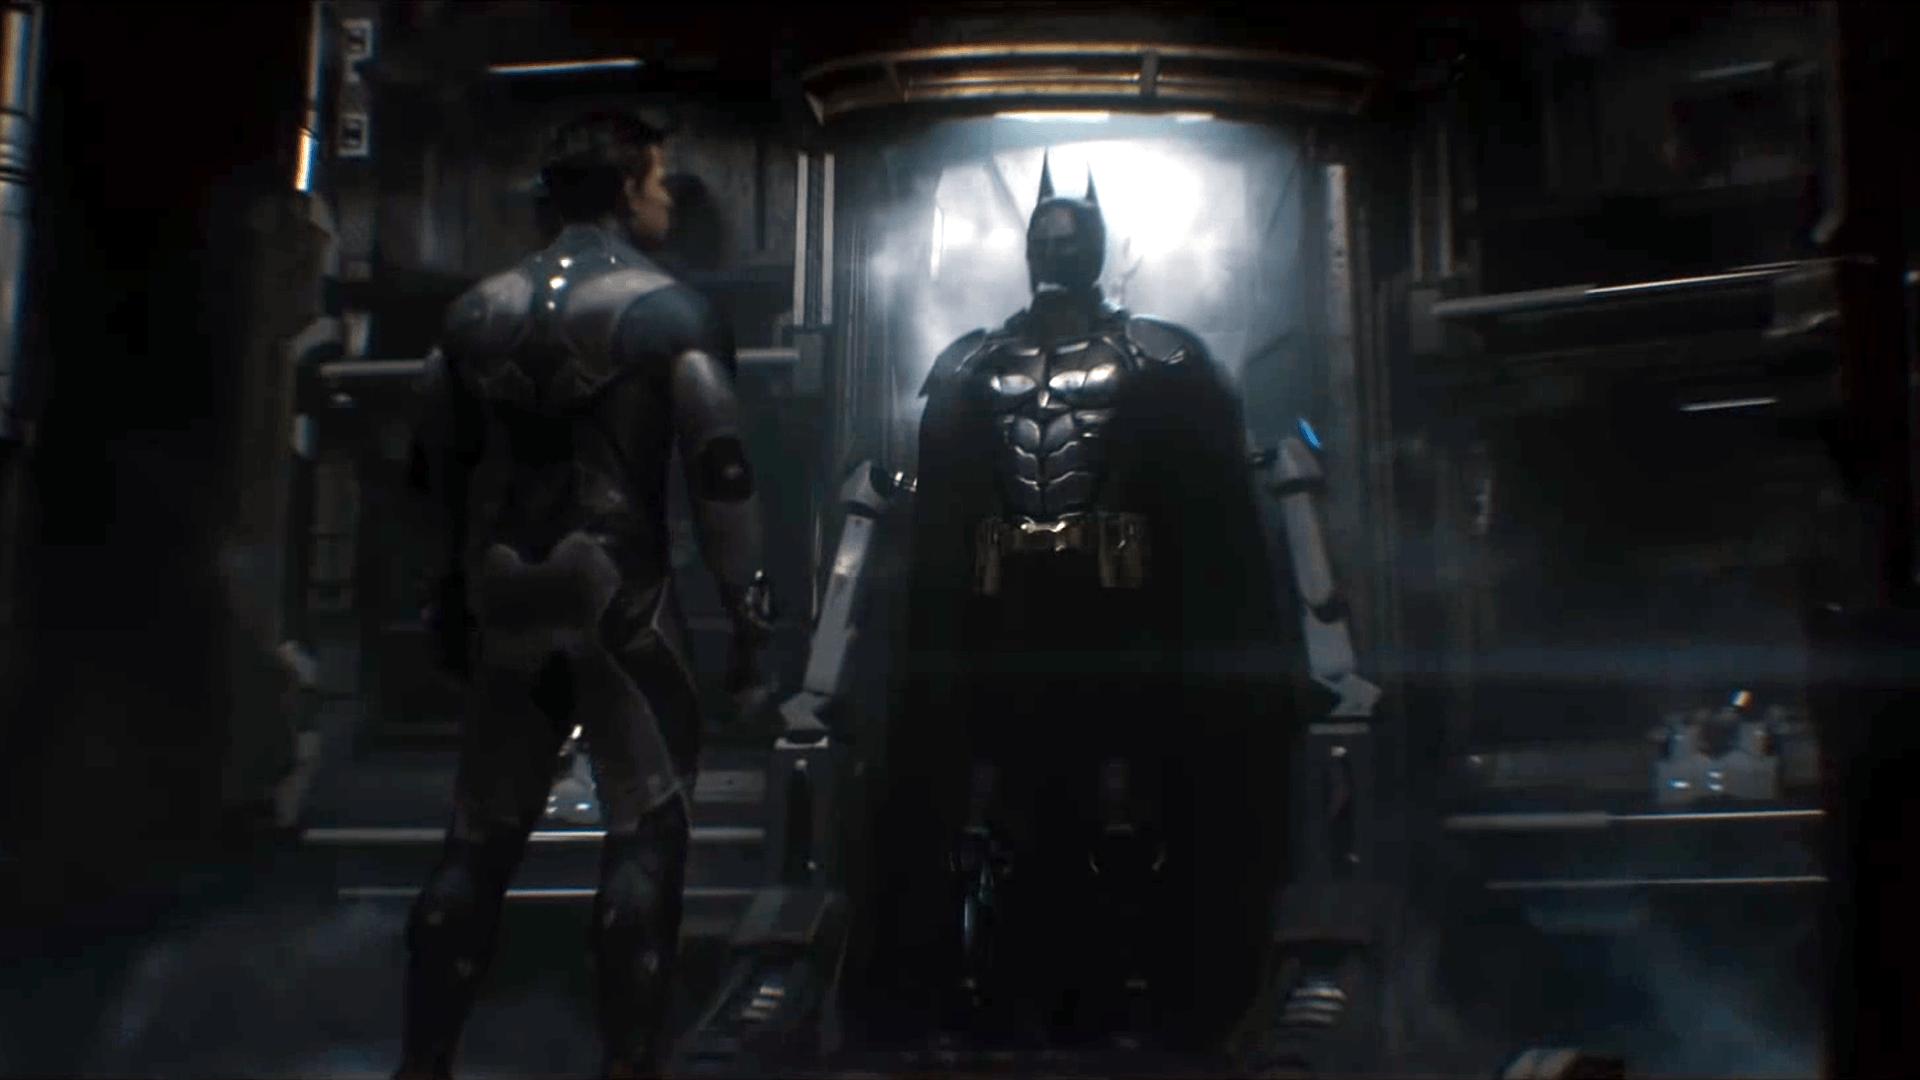 Batman Arkham Knight Wallpapers Top Free Batman Arkham Knight Backgrounds Wallpaperaccess